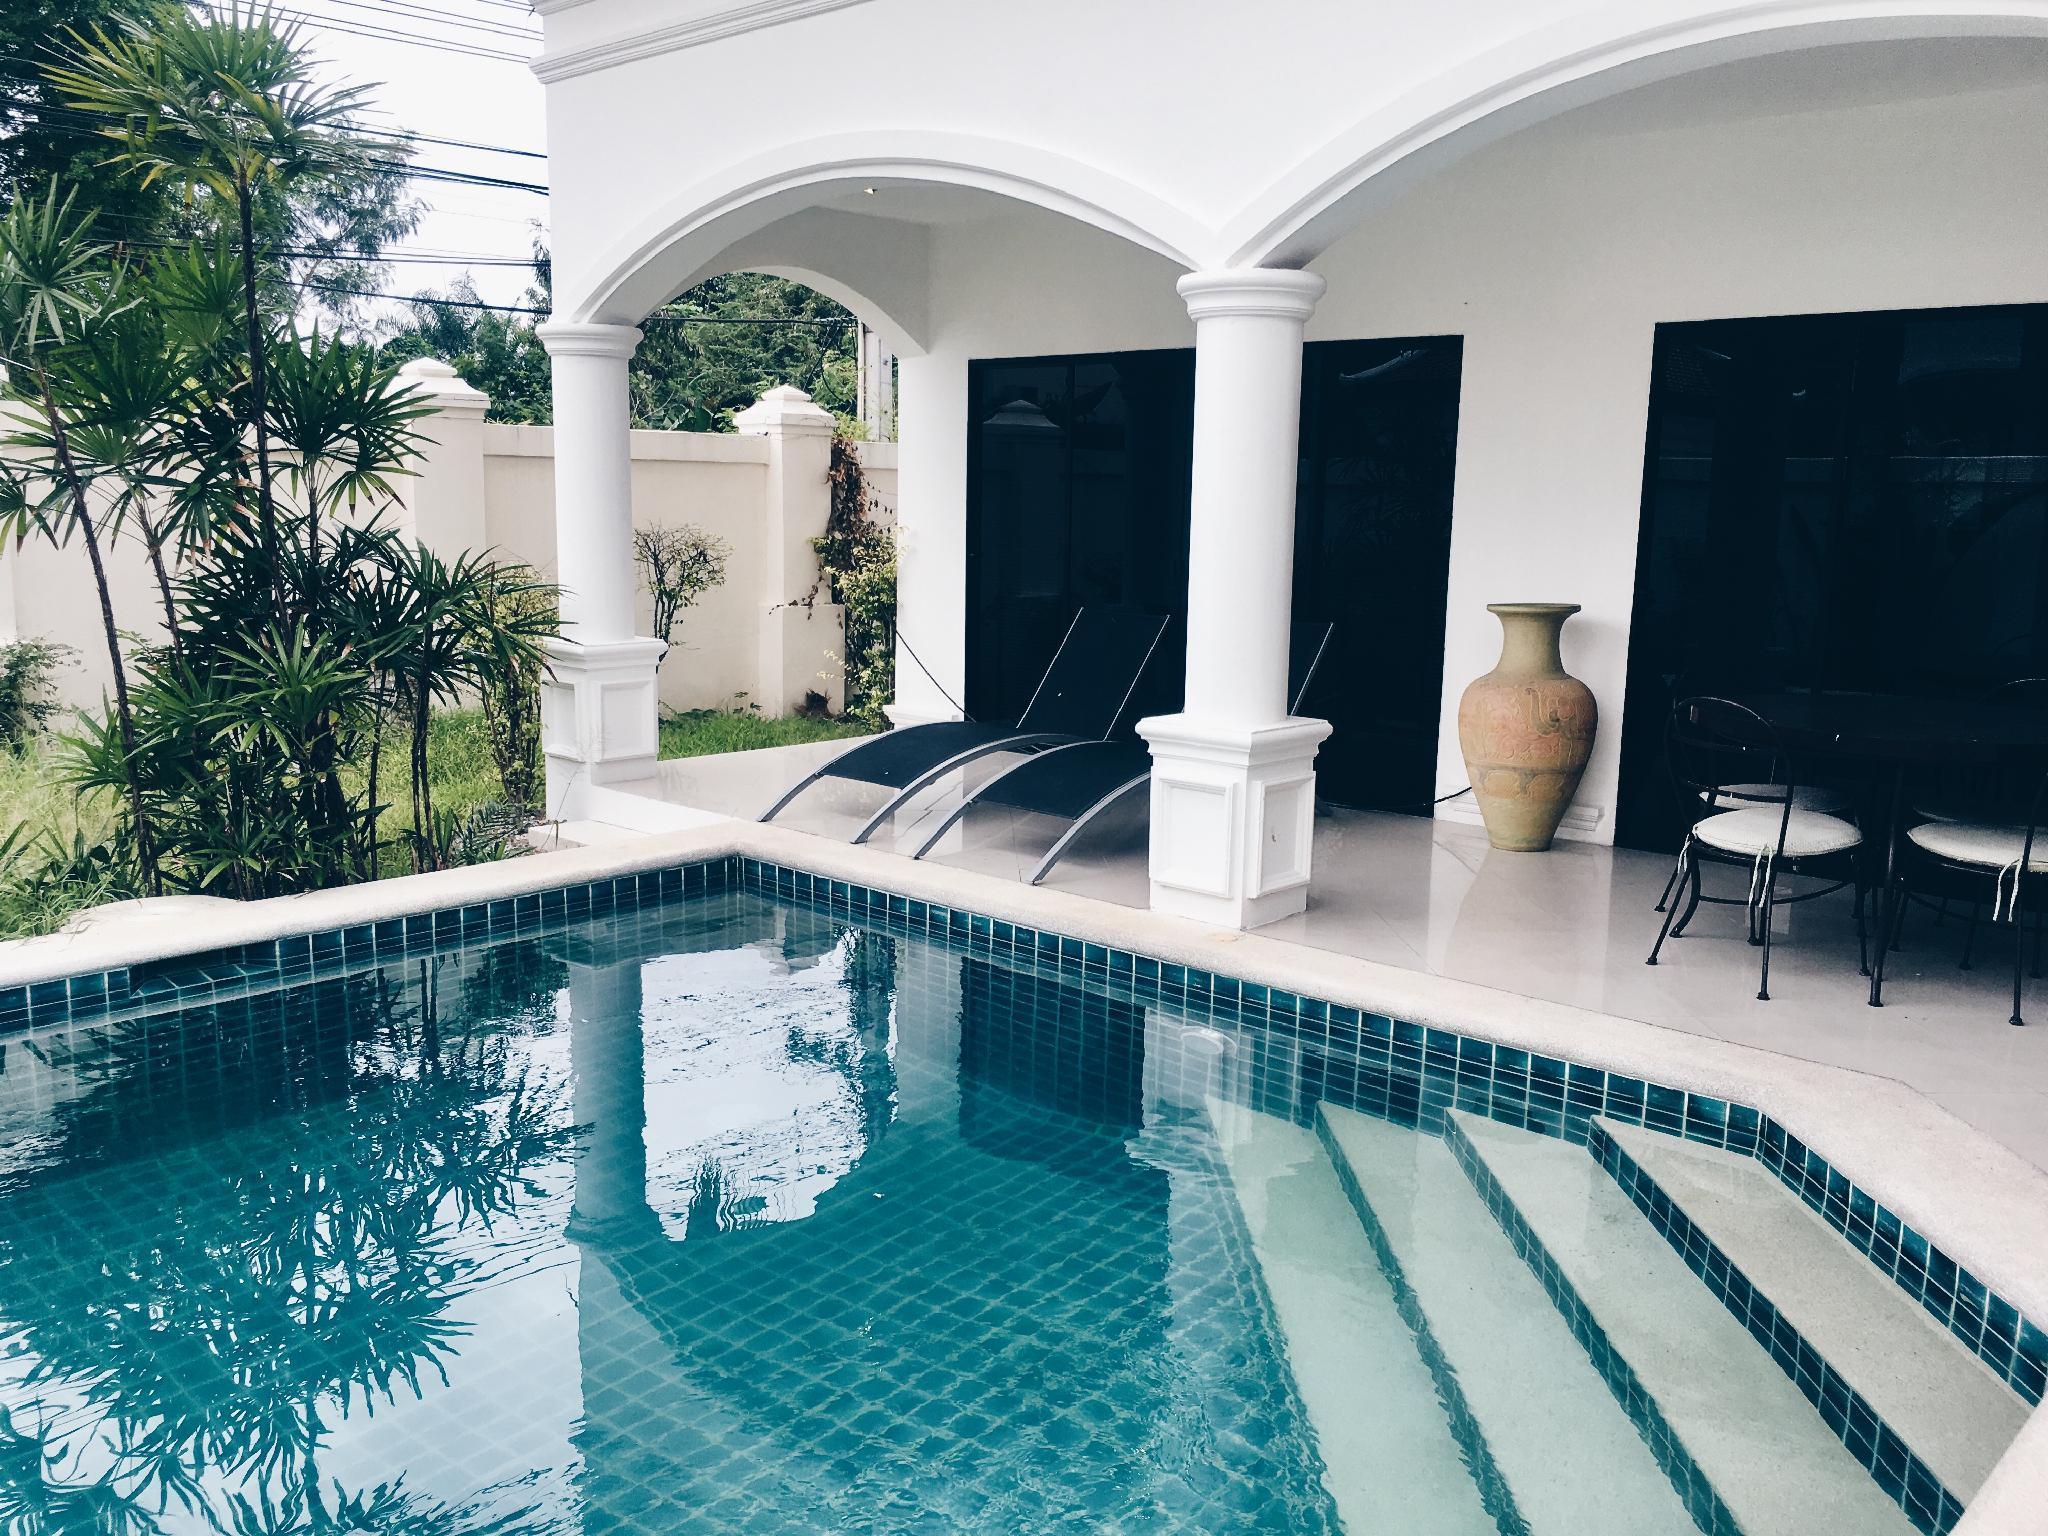 RAI Ocean Lane Luxury Villas วิลลา 3 ห้องนอน 3 ห้องน้ำส่วนตัว ขนาด 170 ตร.ม. – บางสเหร่